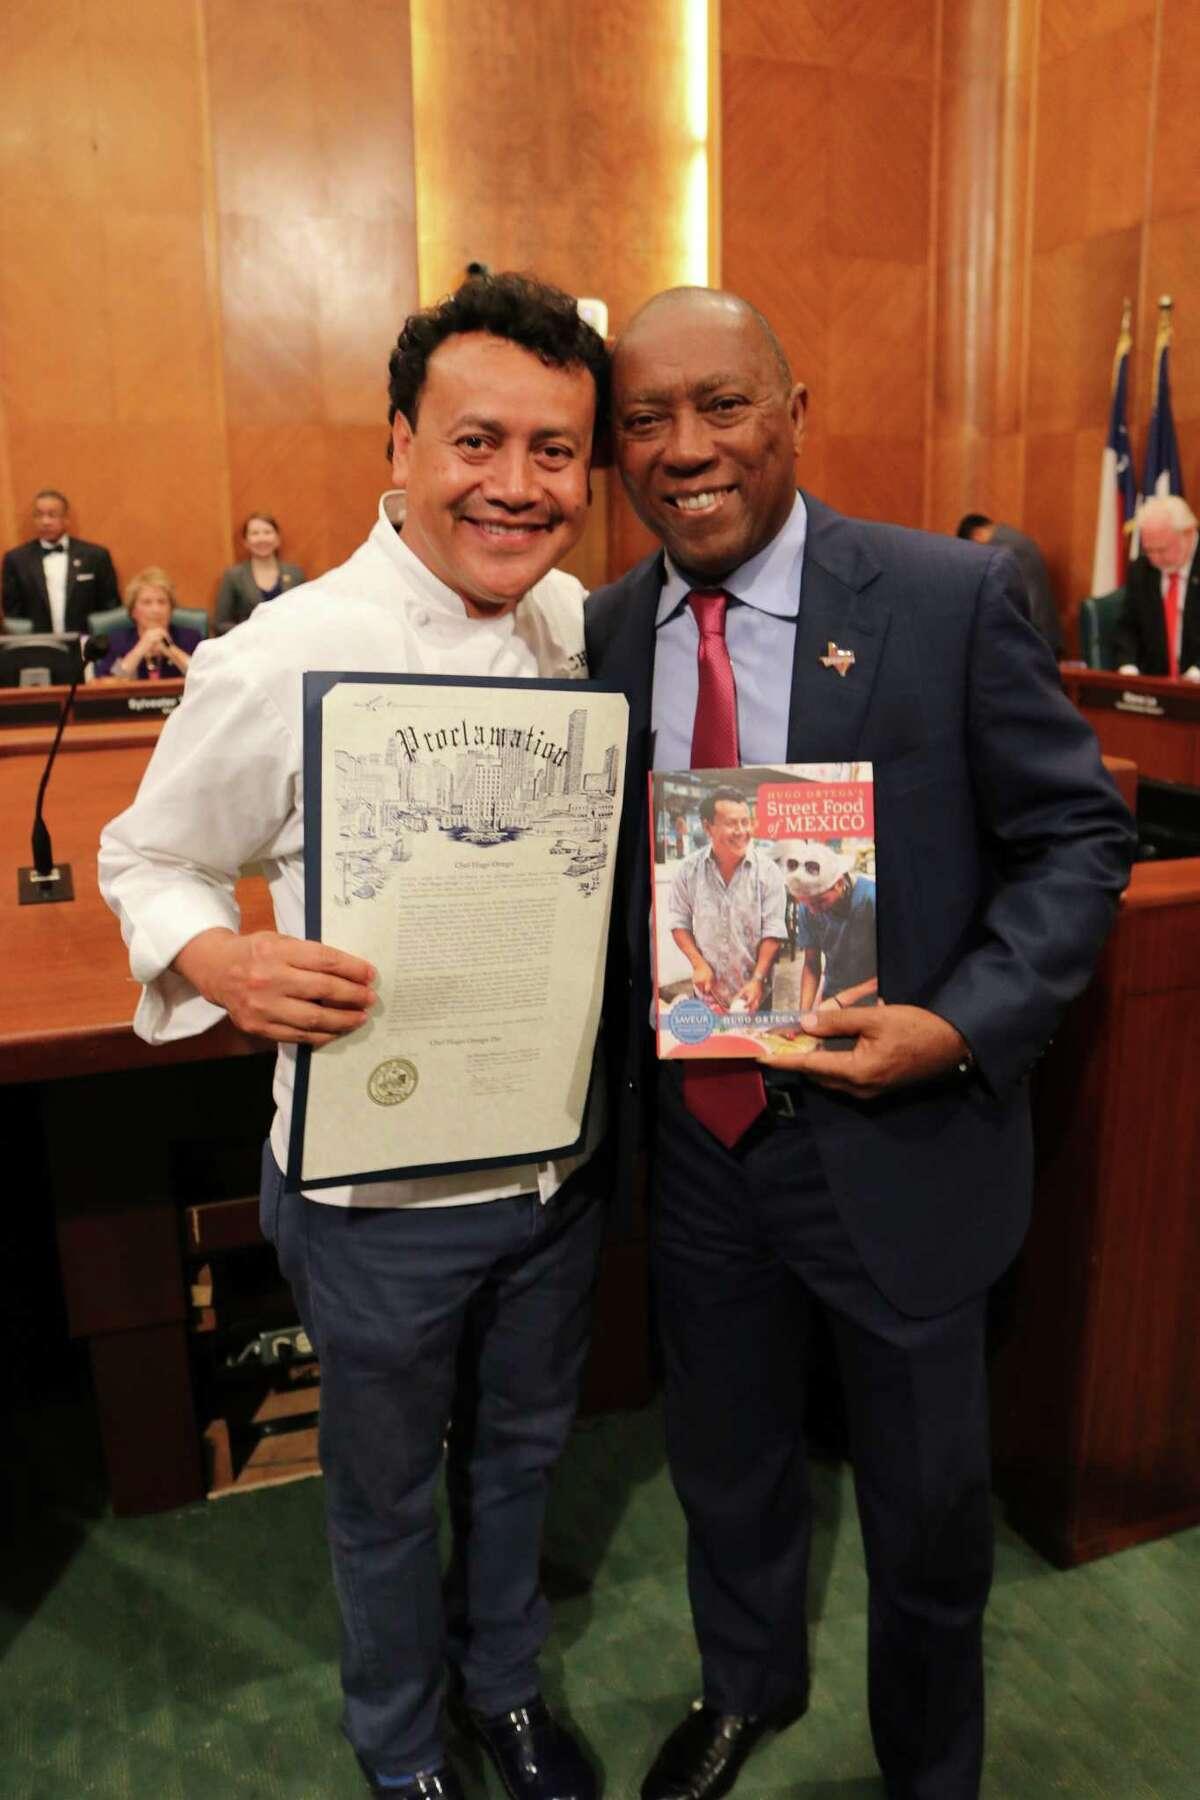 Chef Hugo Ortega receives a proclamation from Mayor Sylvester Turner declaring June 20 Chef Hugo Ortega Day in Houston.